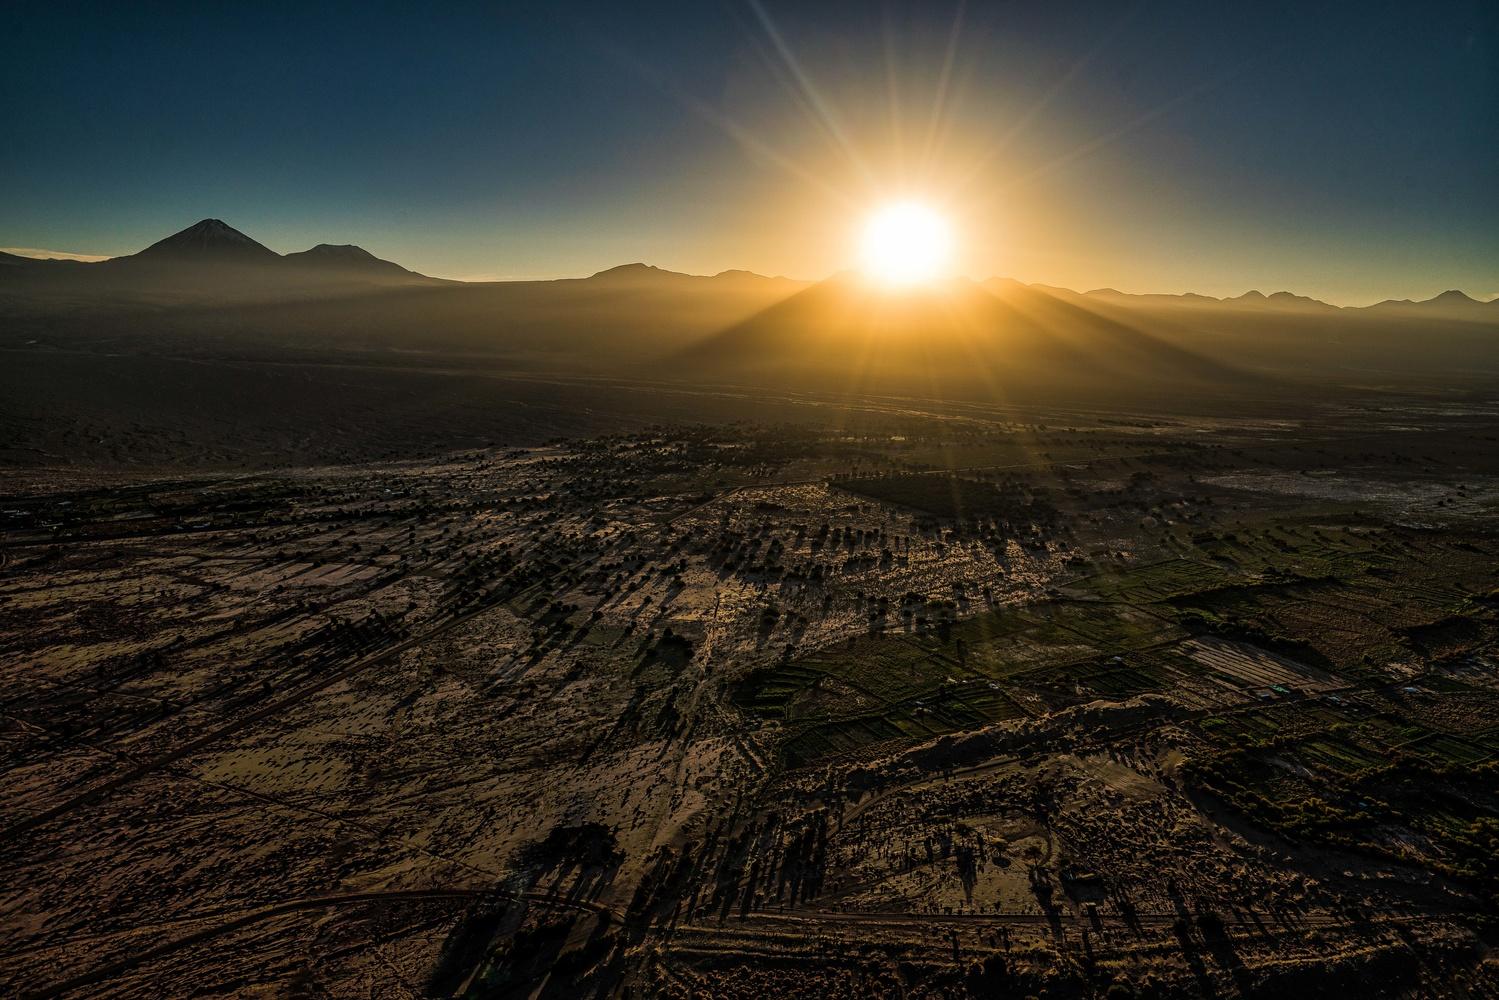 Sunrise by Jaap Venhovens